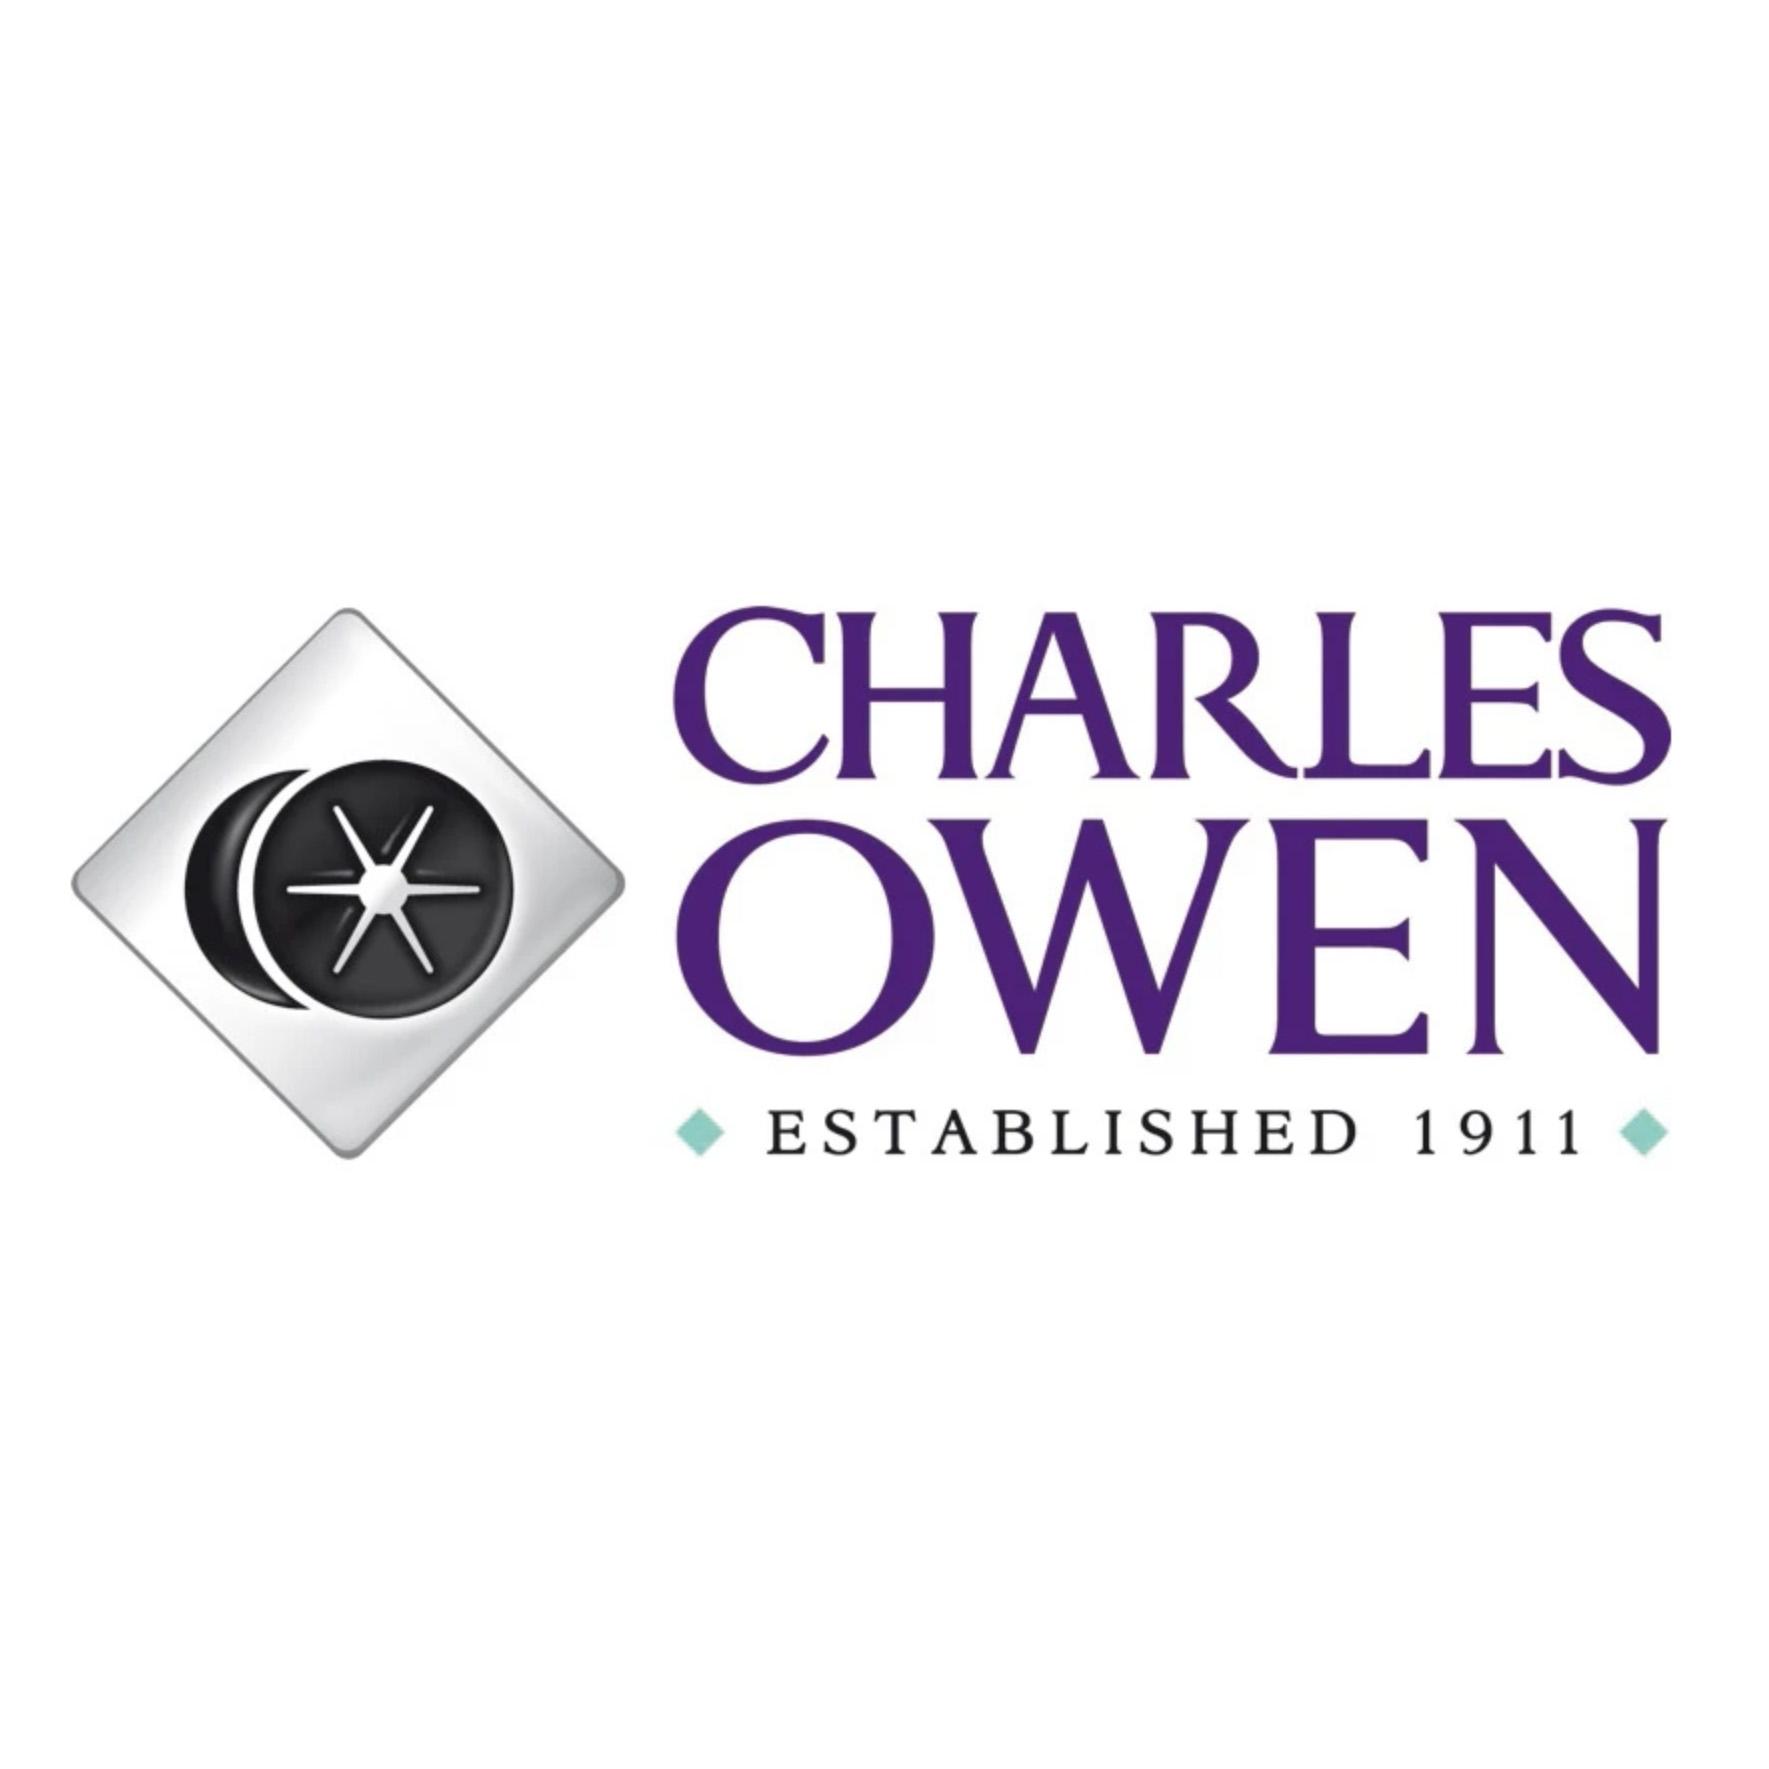 Charles owen - Casques et bombes